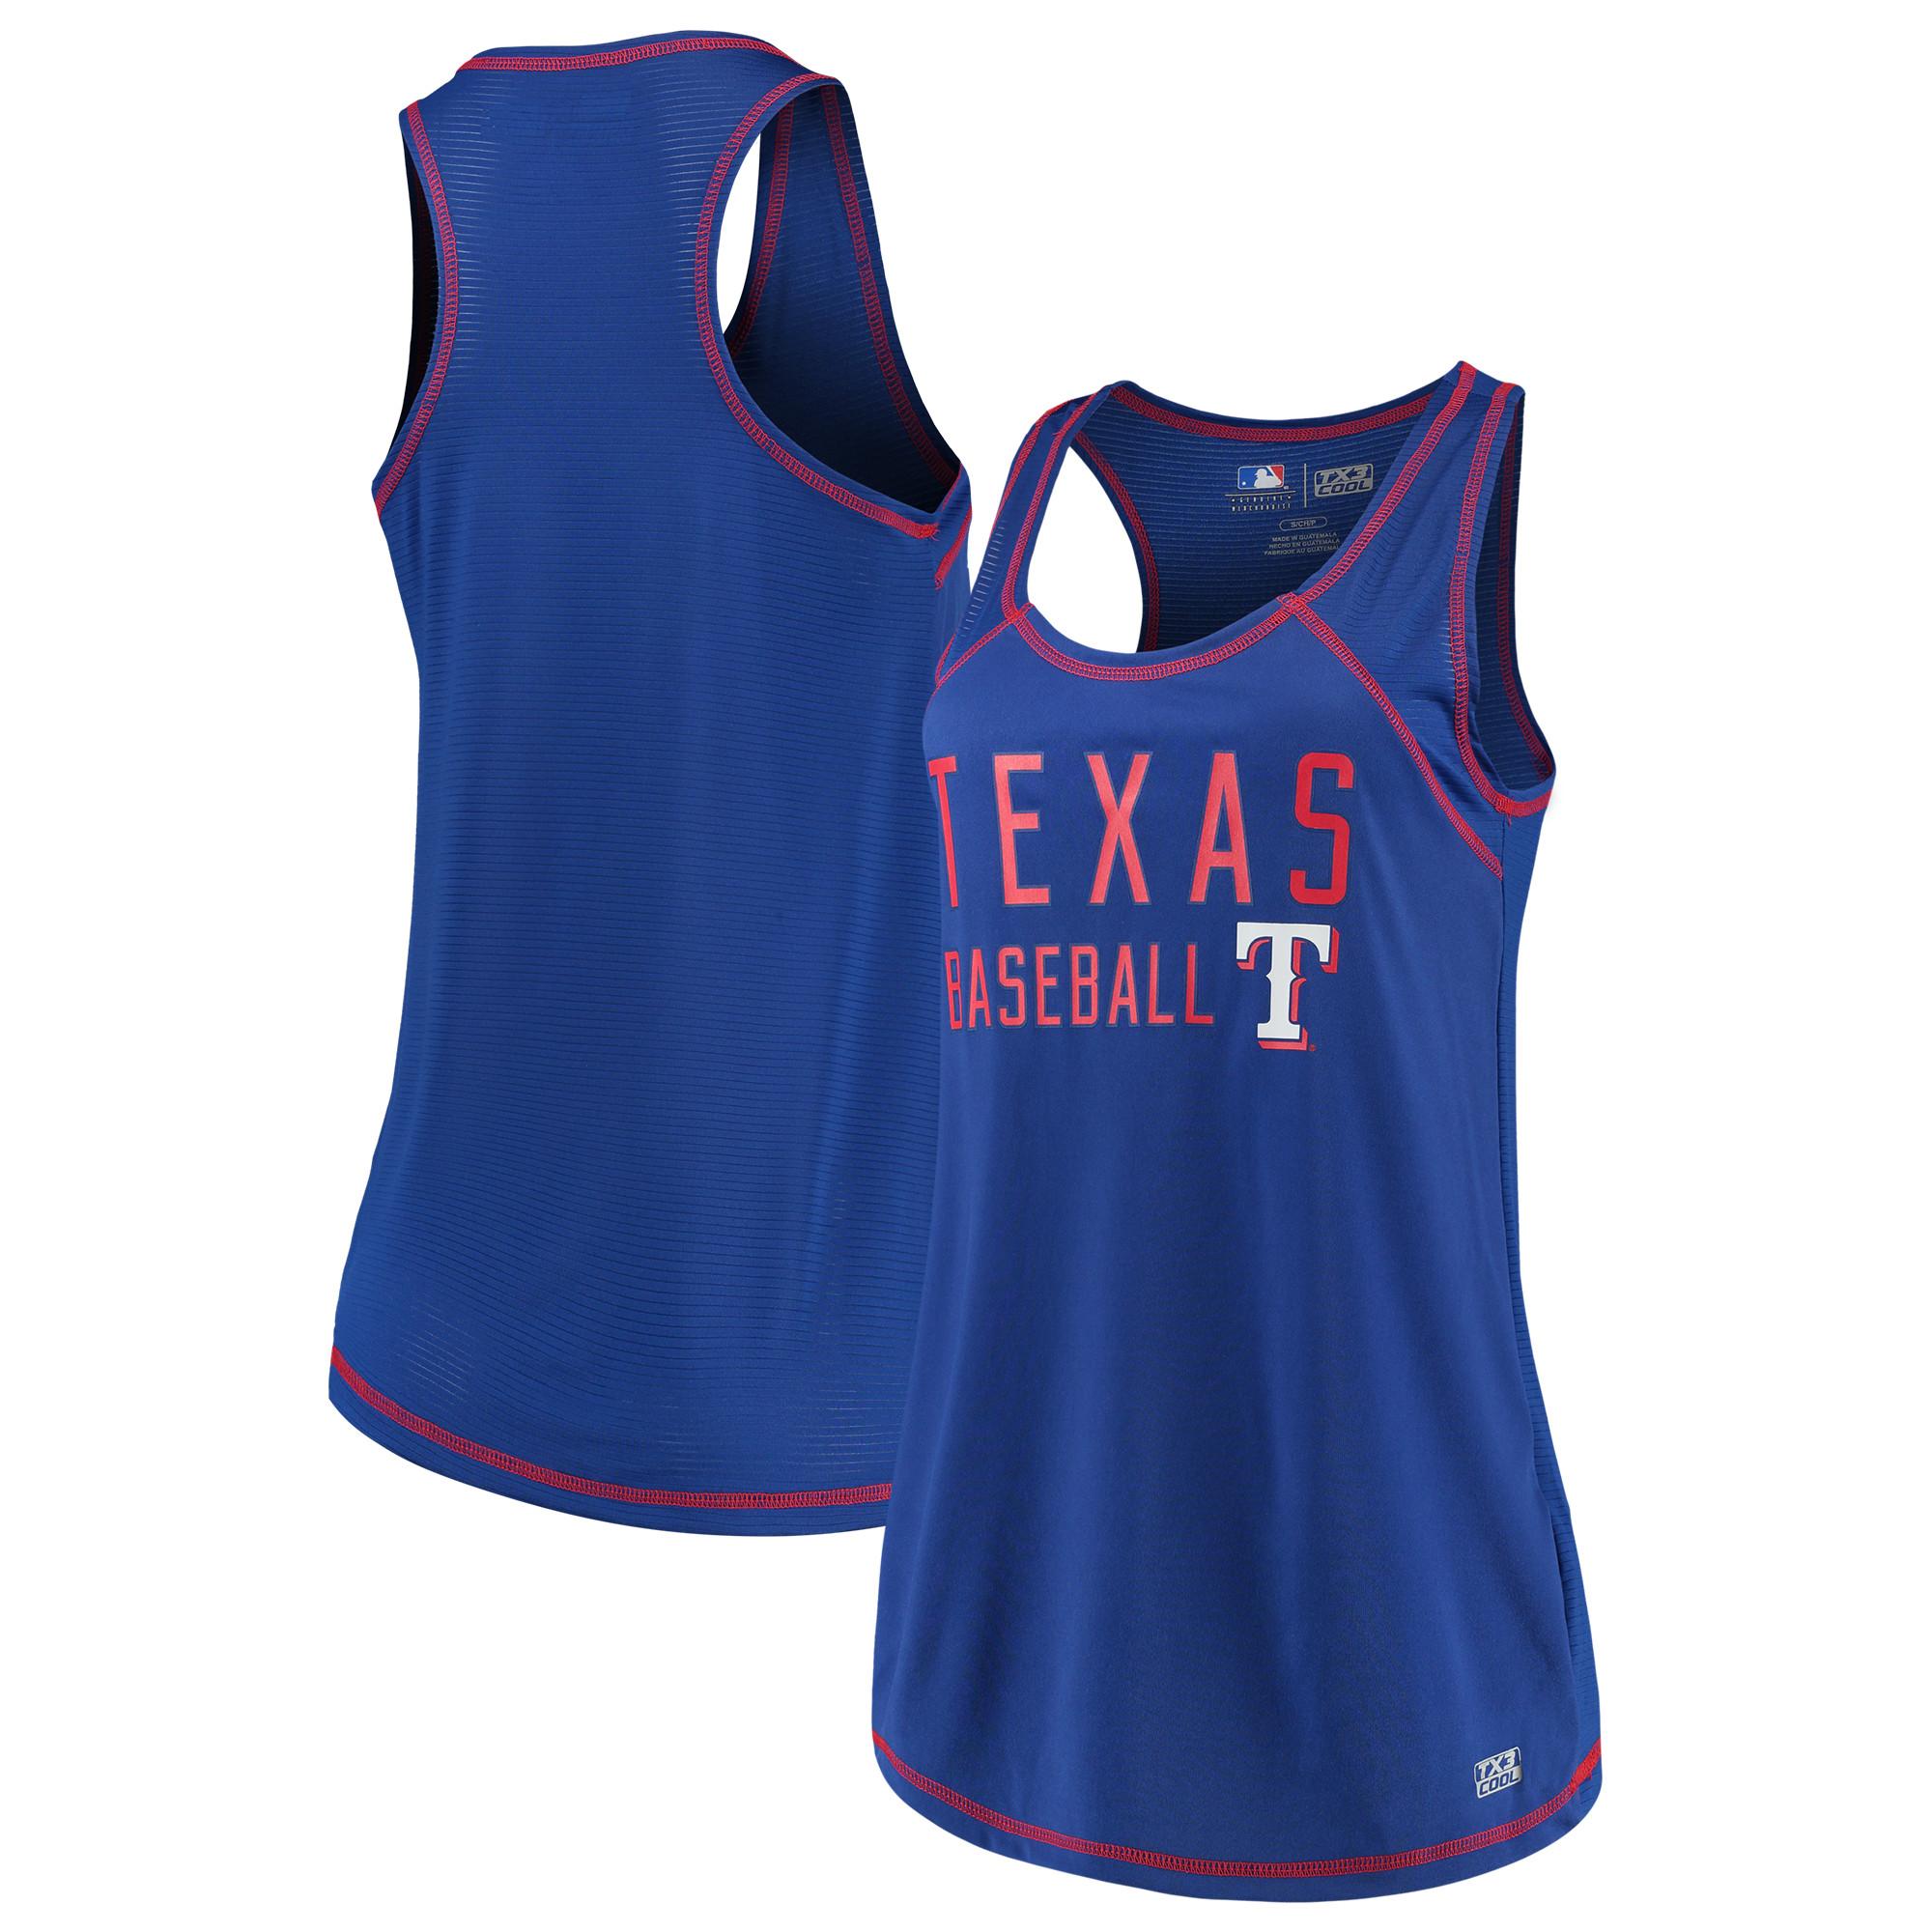 Women's Majestic Royal Texas Rangers TX3 Cool Fabric Scoop Neck Tank Top